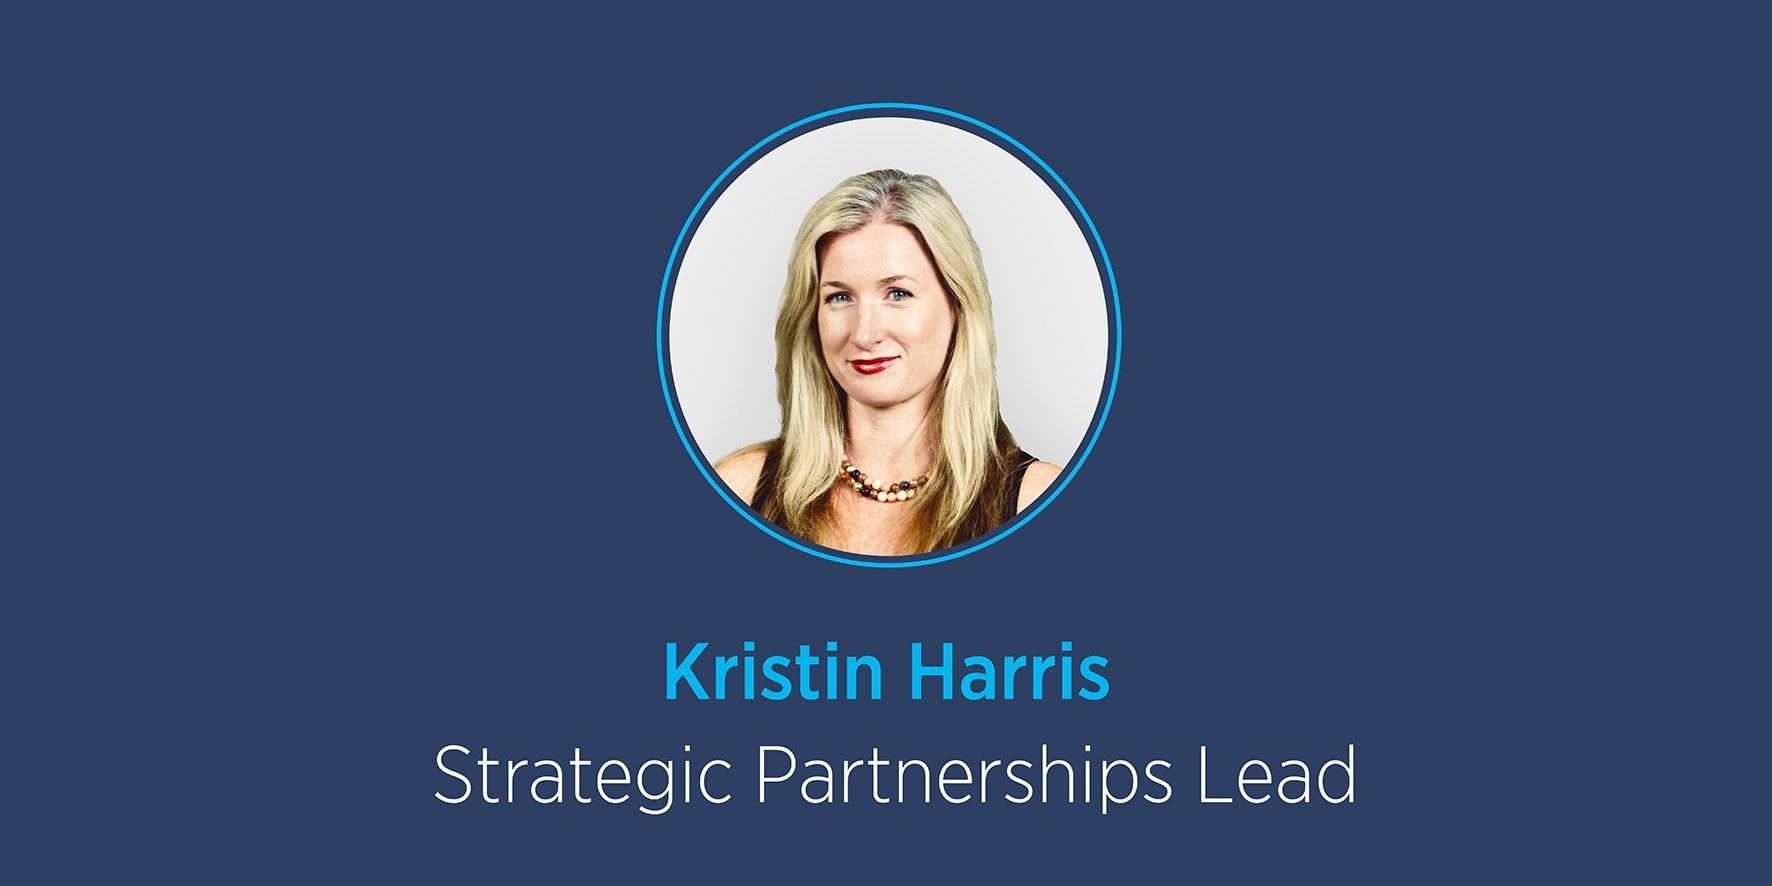 Kristin Harris Strategic Partnerships Lead at Spotlight Reporting .jpg